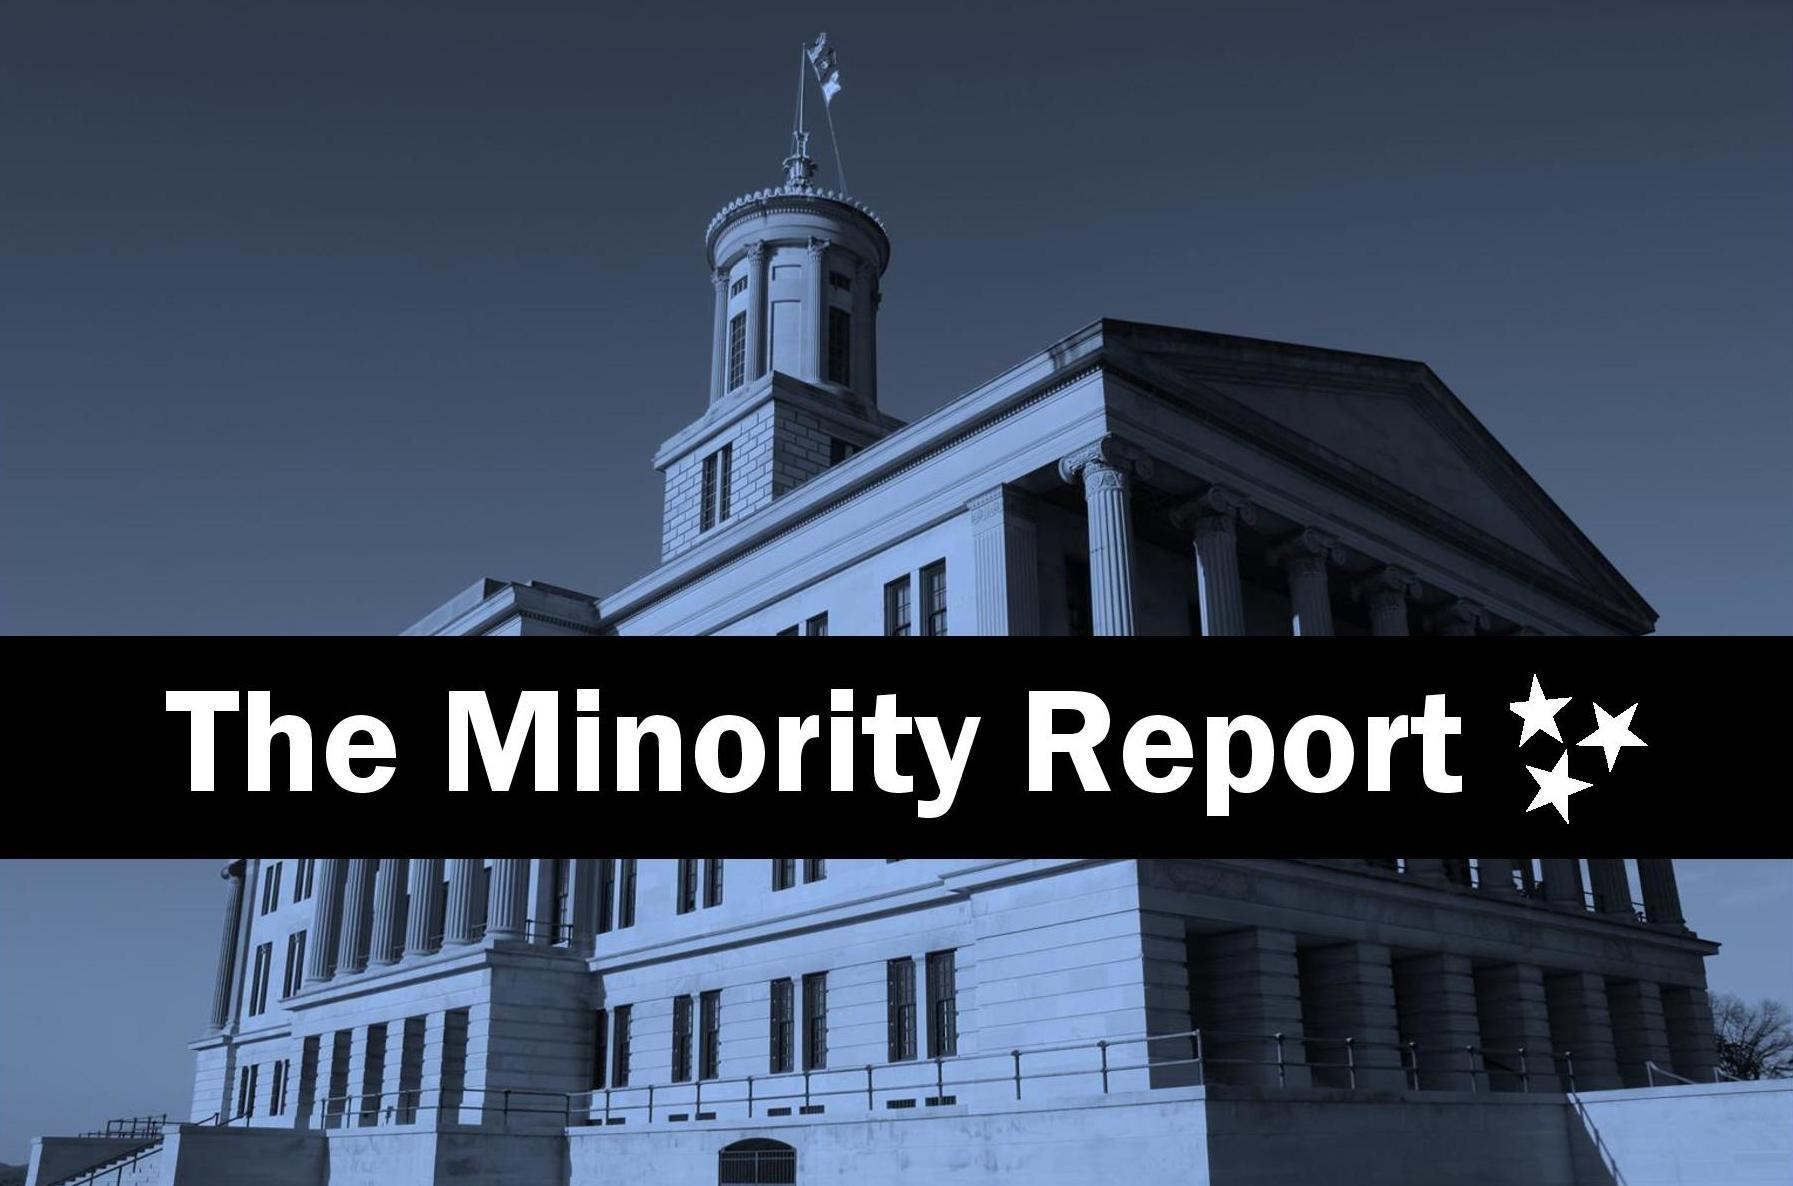 rsz_minority_report-page-001.jpg